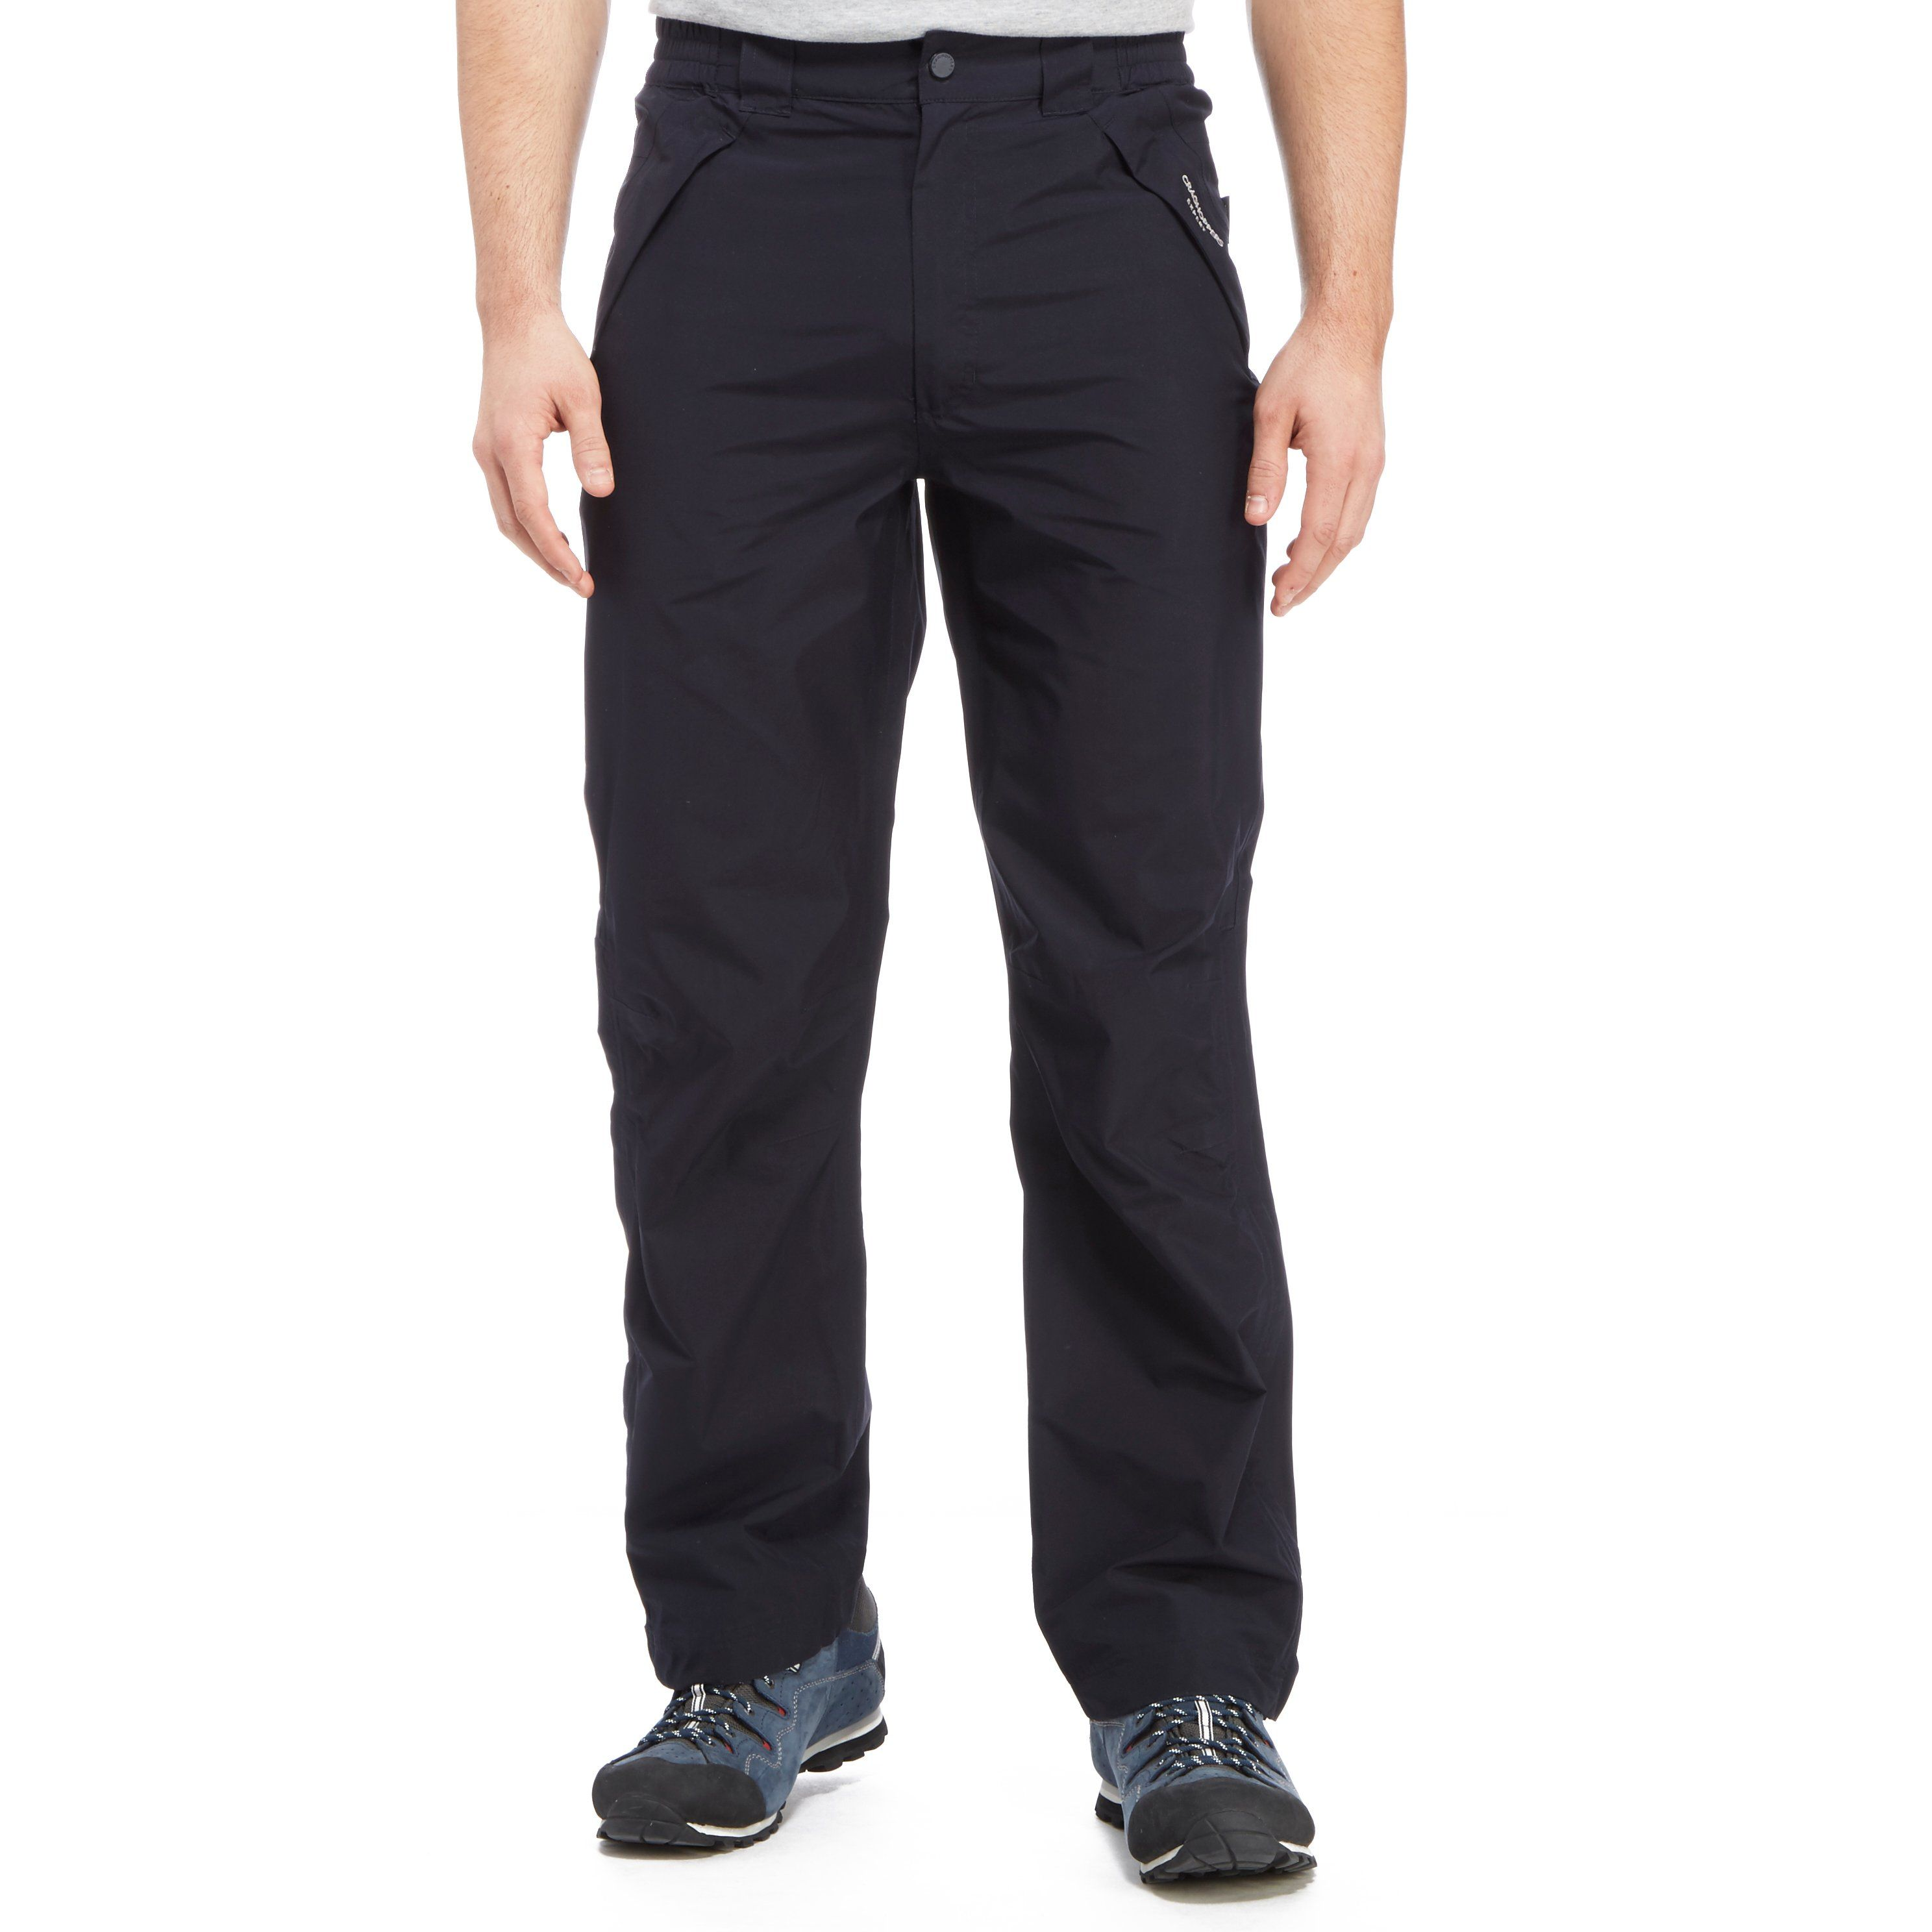 CRAGHOPPERS Men's Kiwi GORE-TEX® Trousers